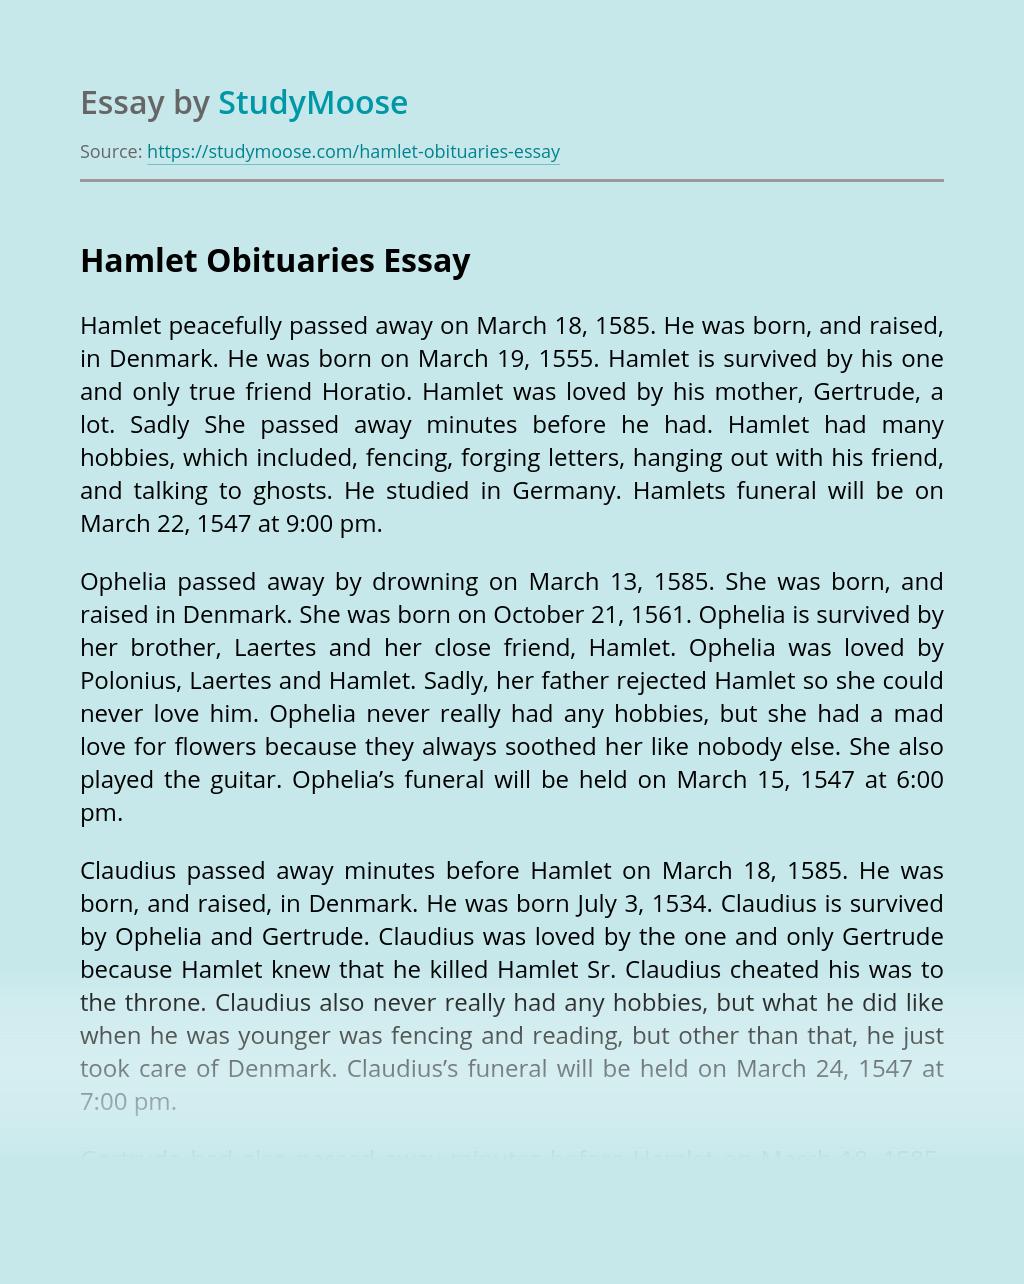 Hamlet Obituaries